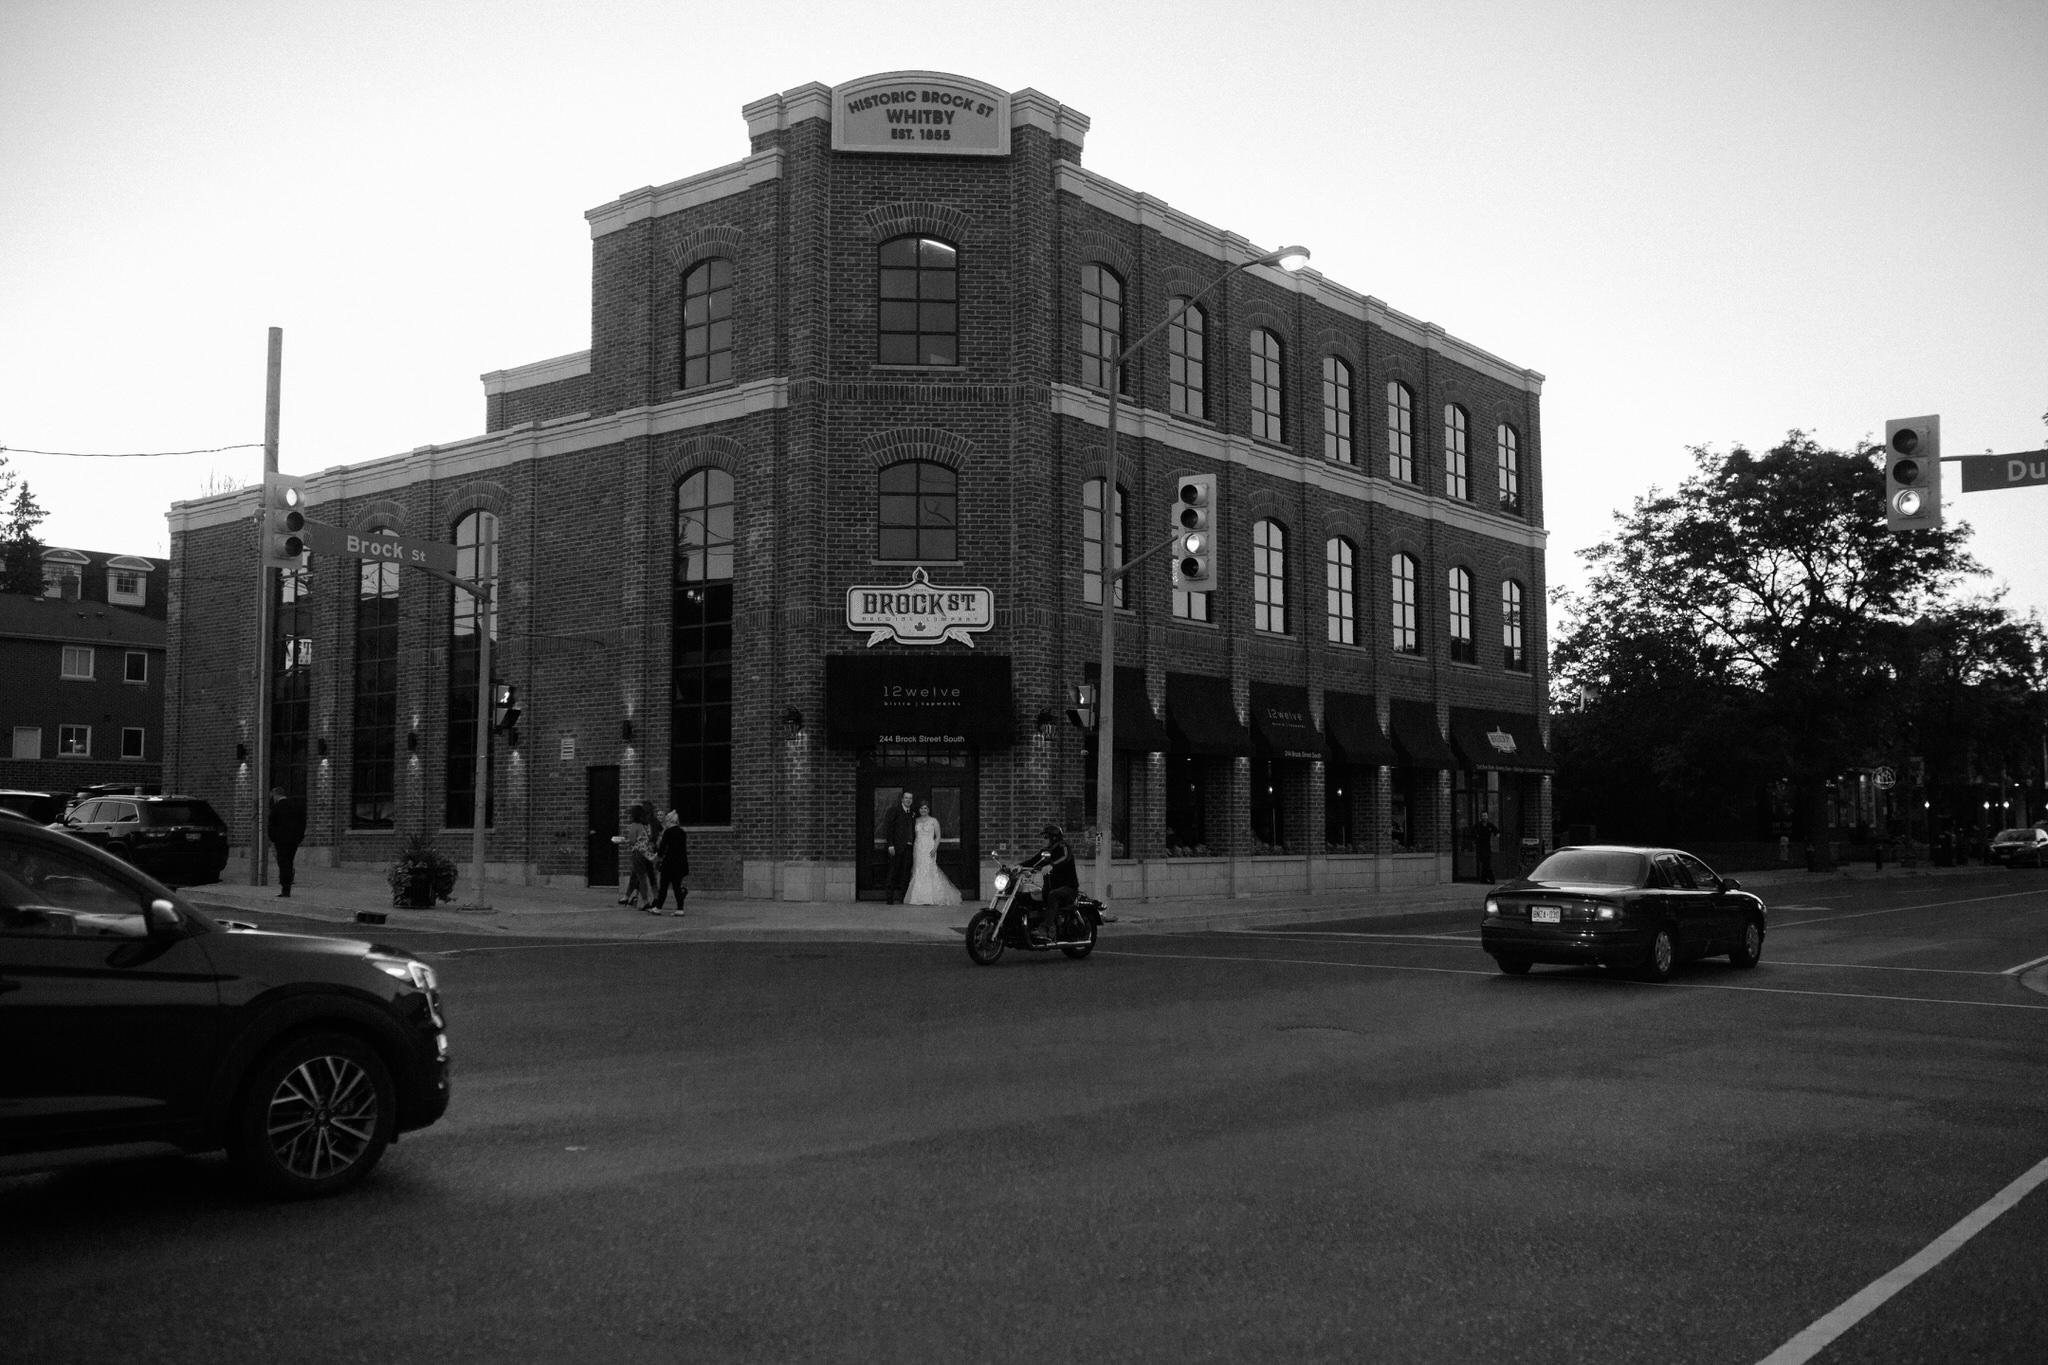 Brock Street Brewing Co. Wedding - the venue